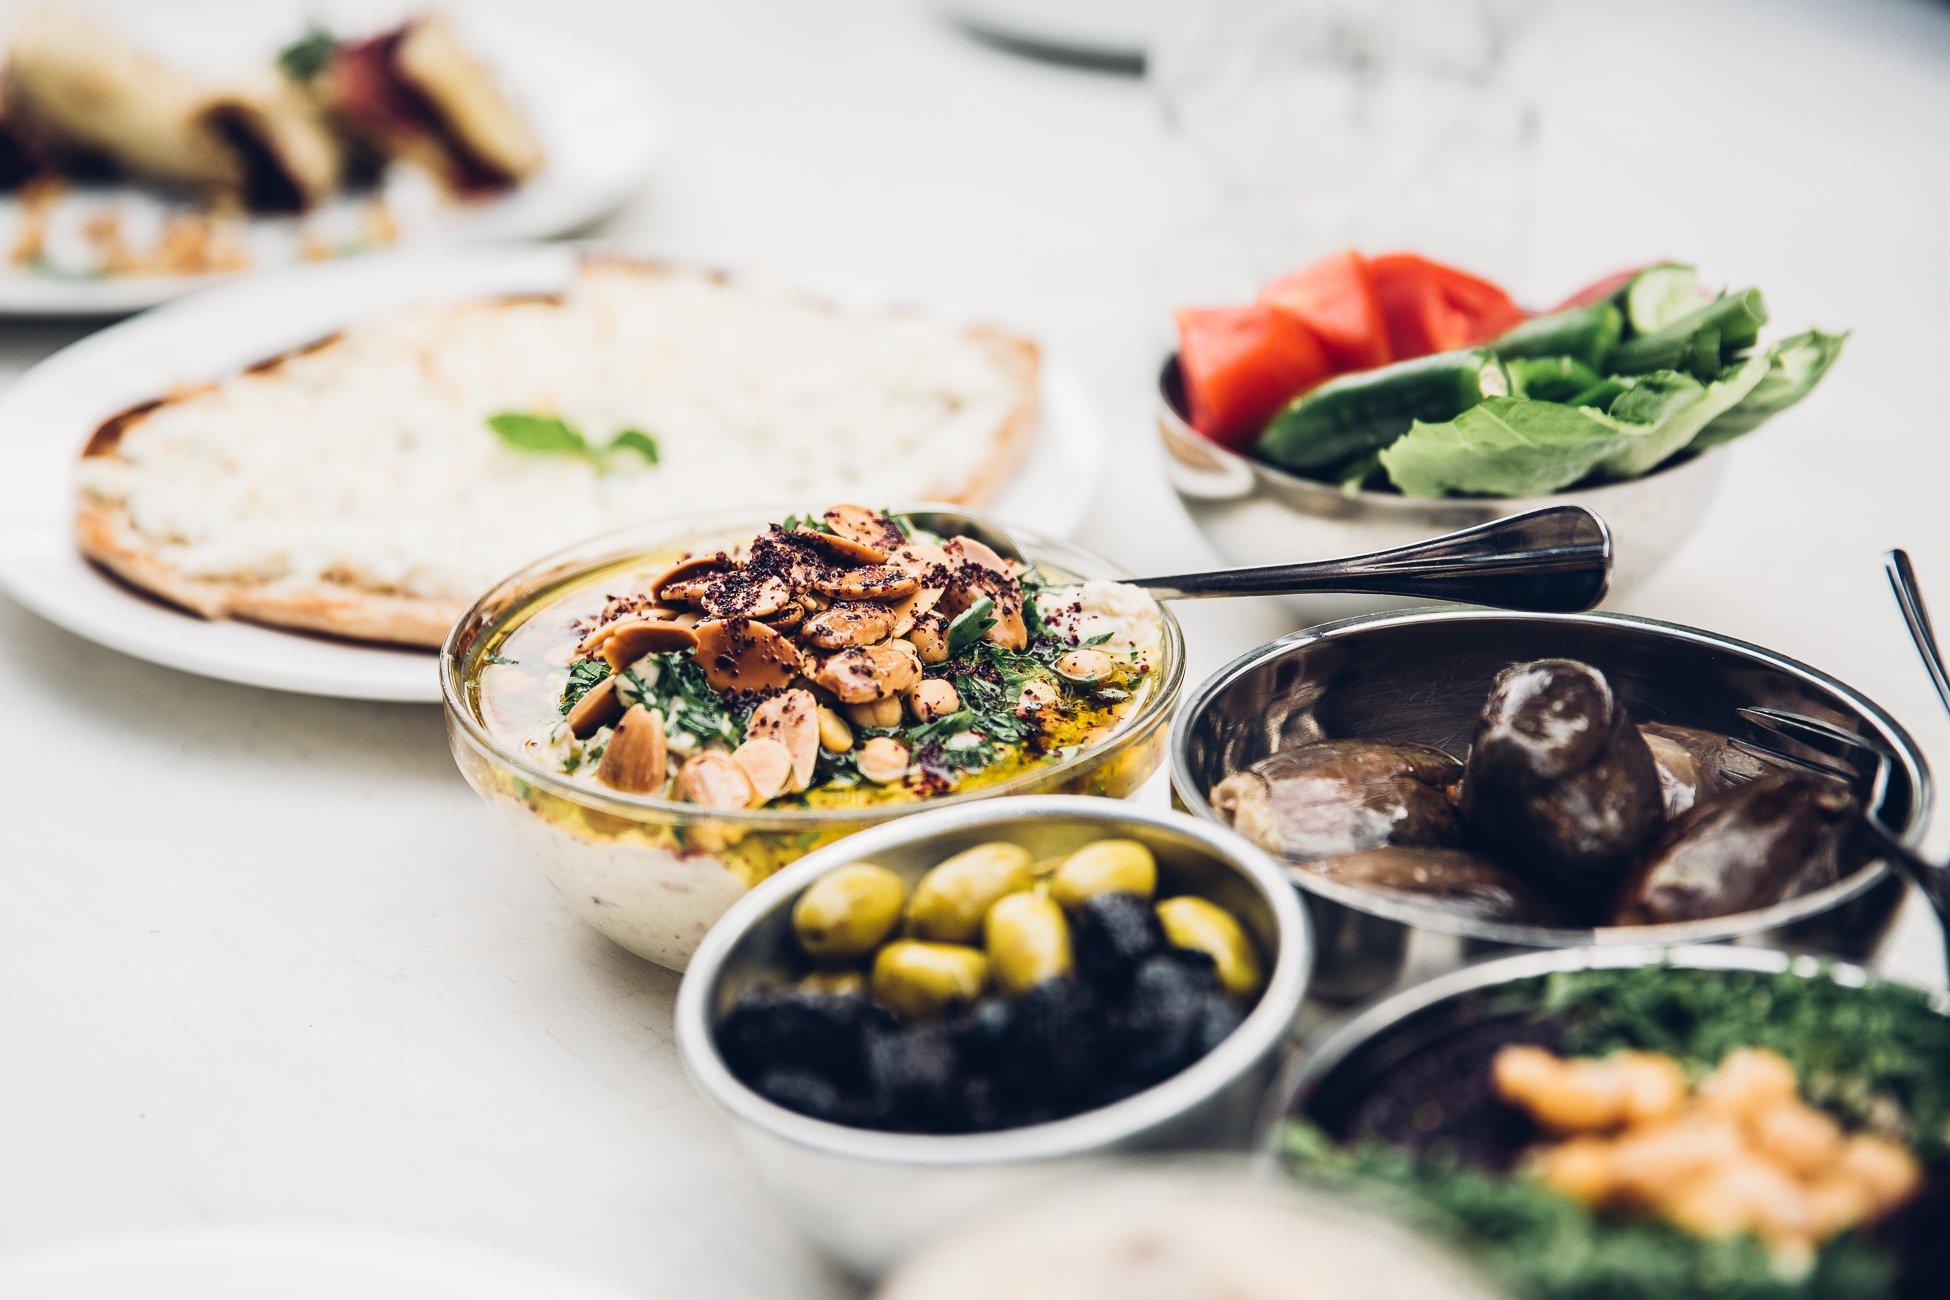 Shams El Balad Amman Breakfast during 24 hours in Amman